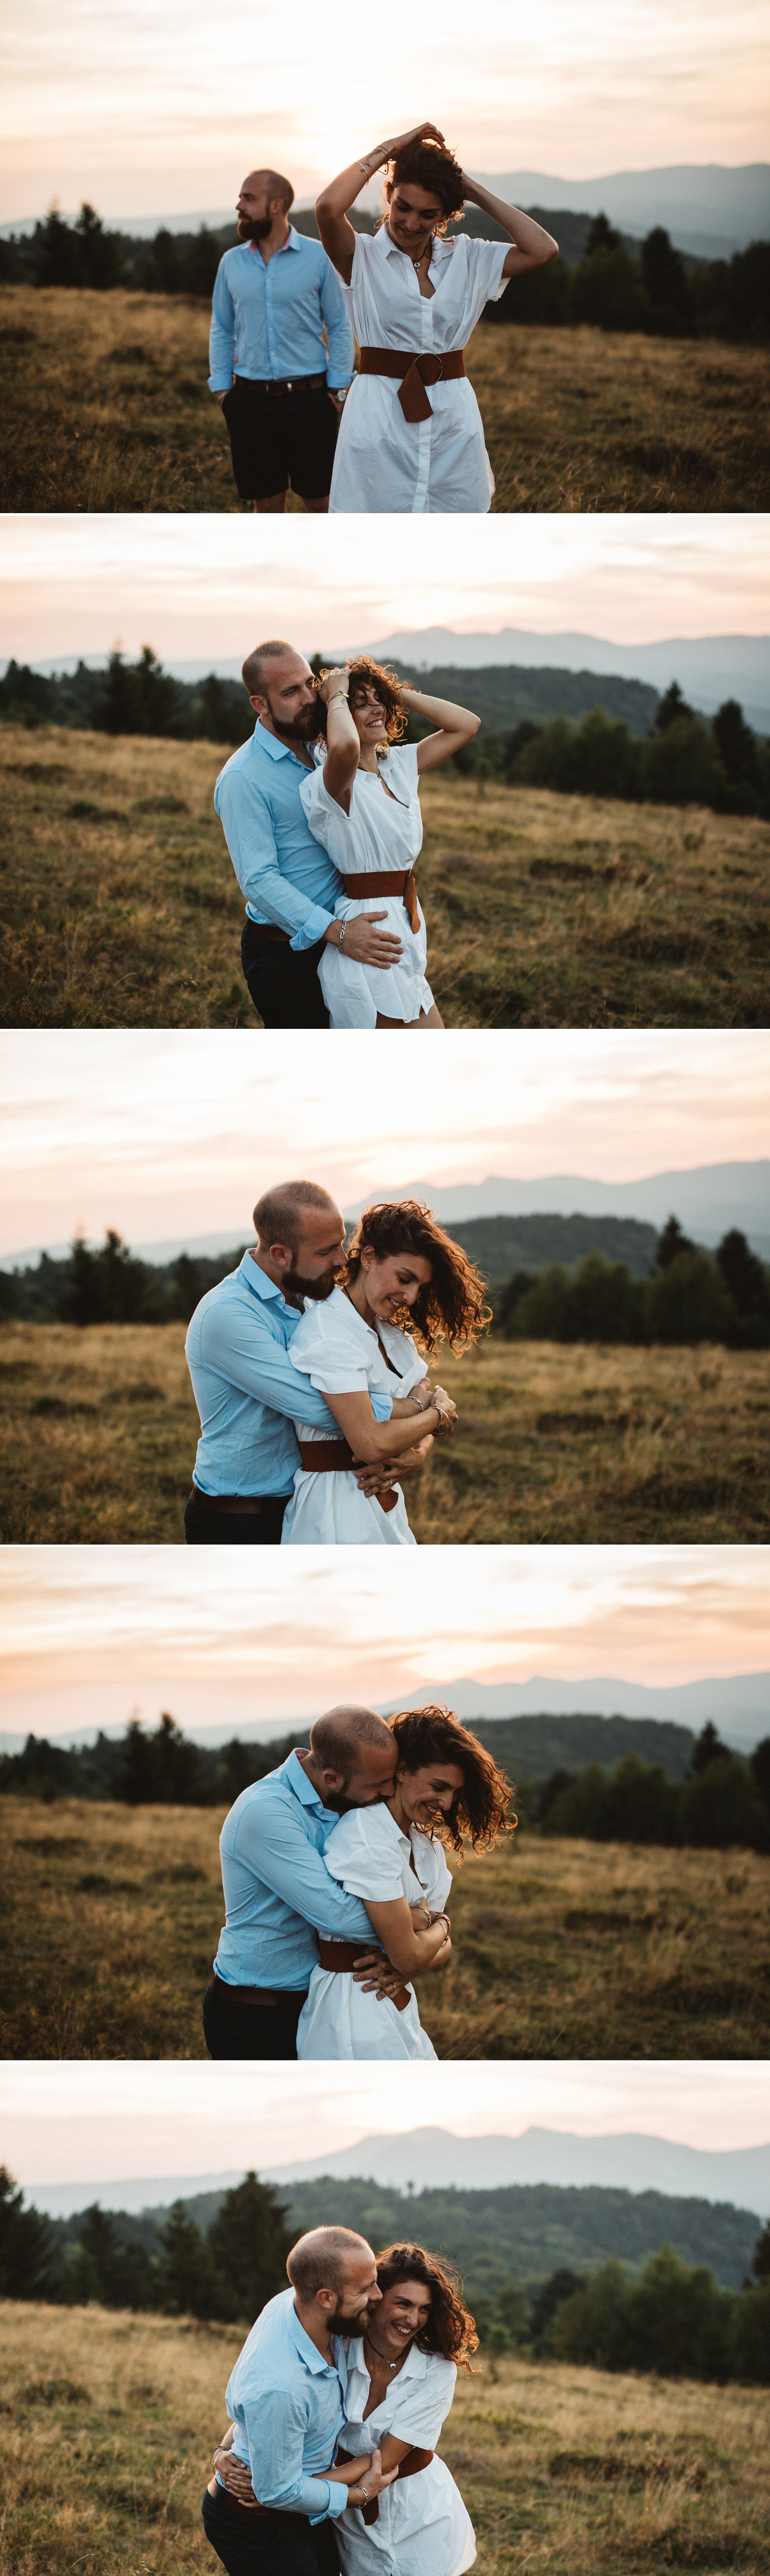 engagement-alsace-21.jpg